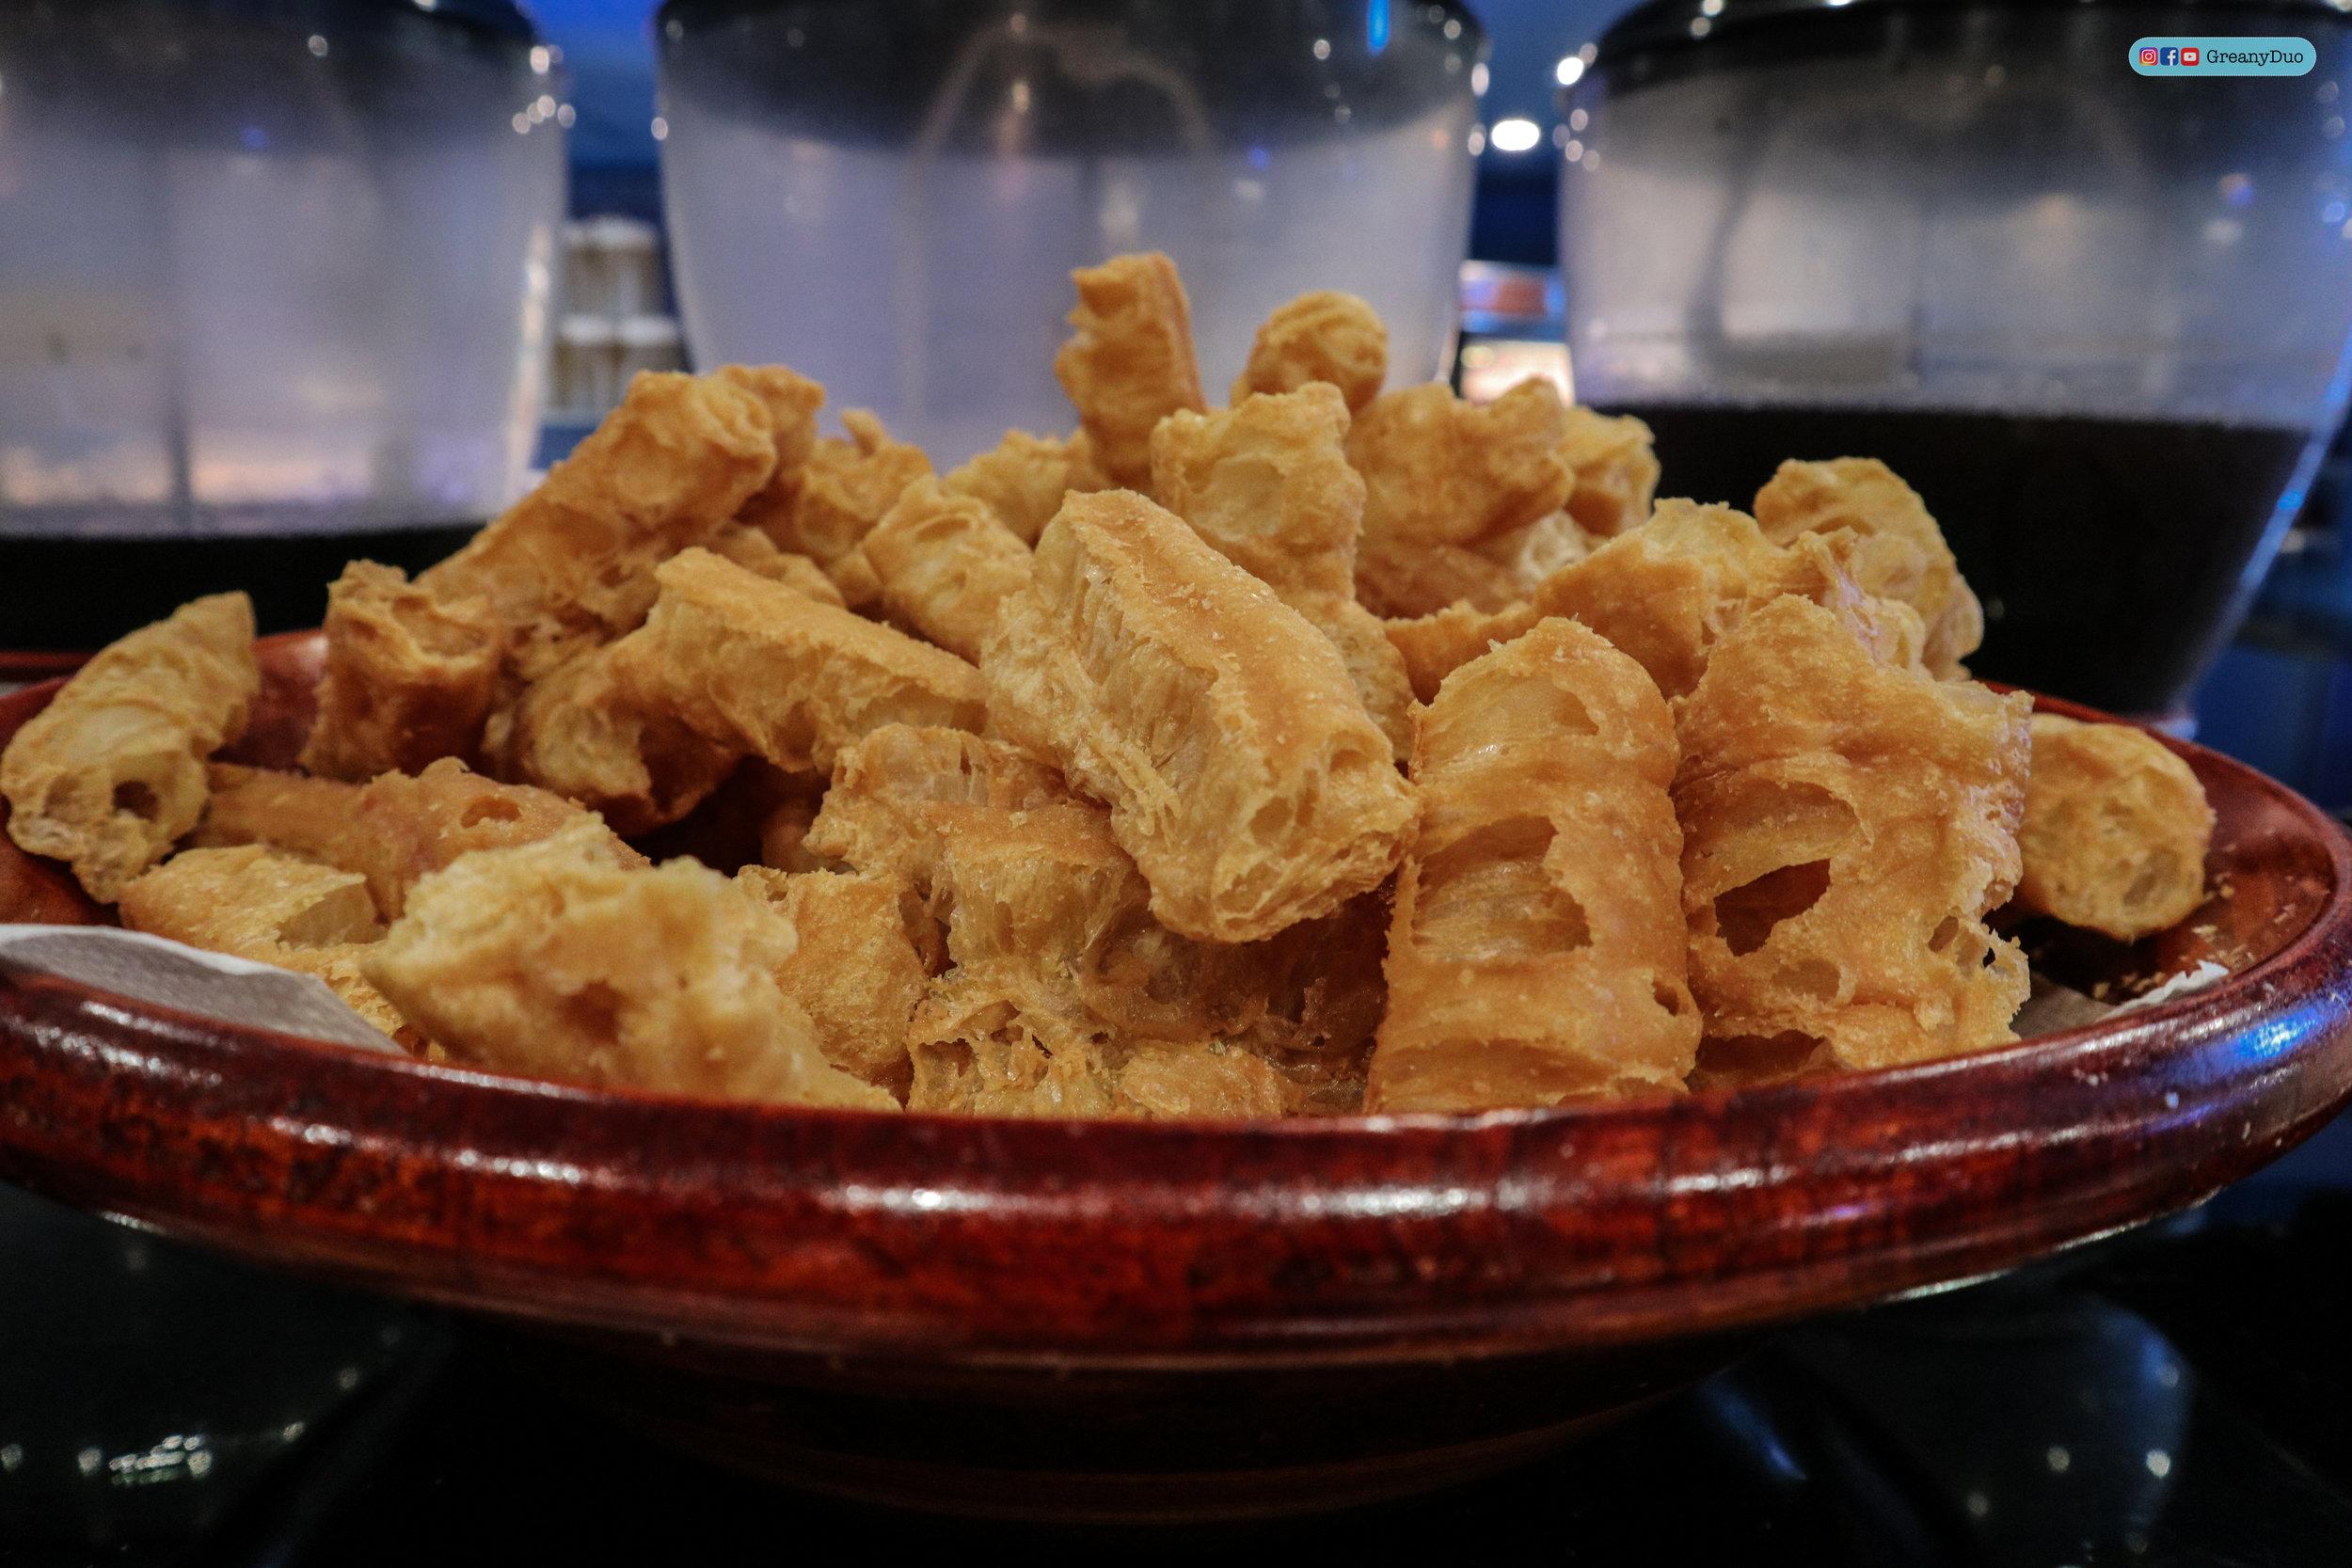 deep fried dough stick at บุฟเฟ่ต์ชาบูไต้หวันที่ Hakkai Shabu Shabu ซีเหมินติง